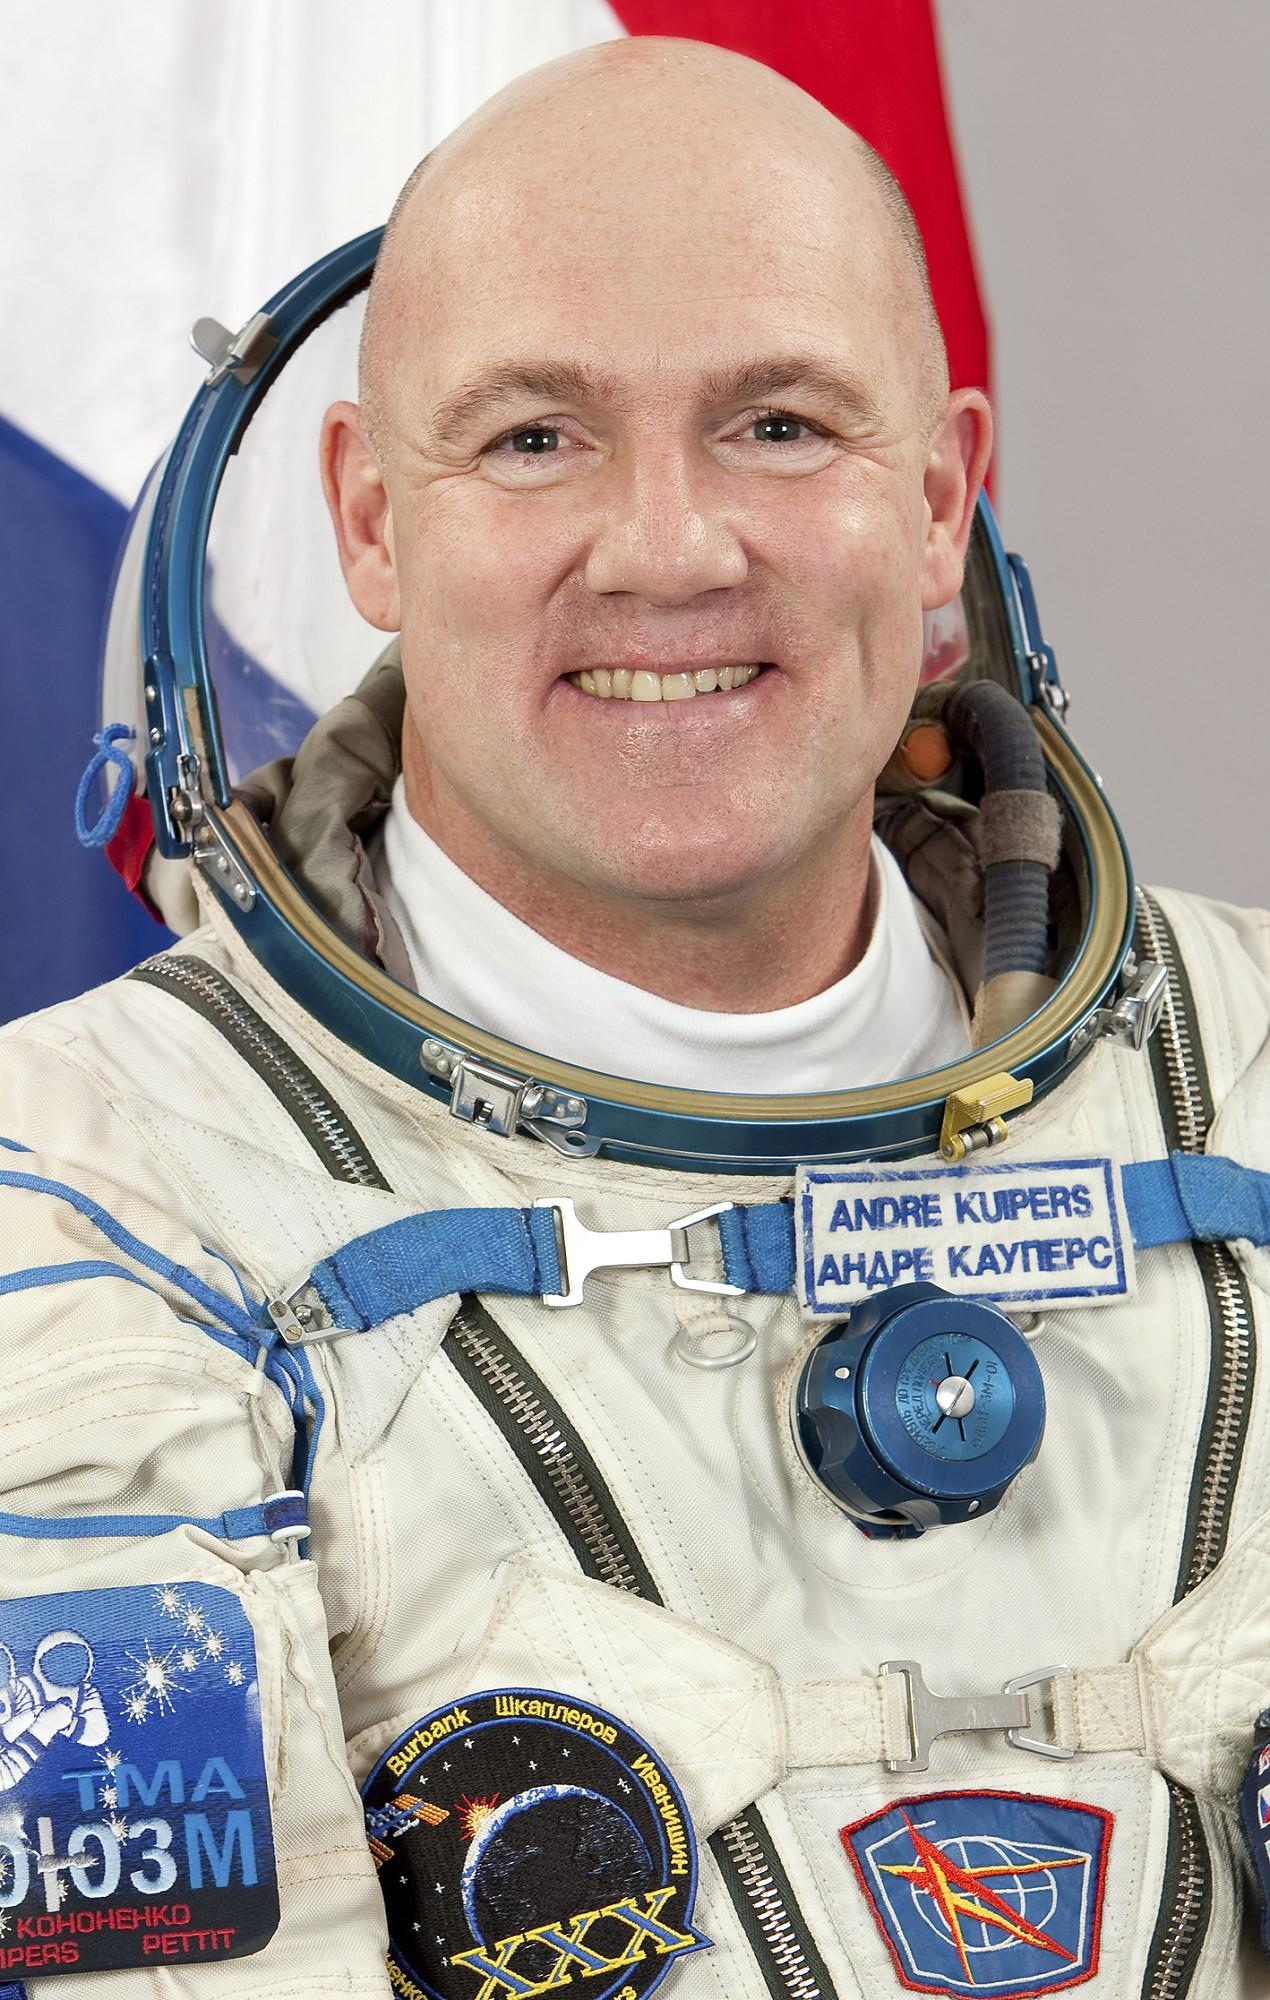 HD wallpaper Foto amazing Astronaut sch n Erde hipster